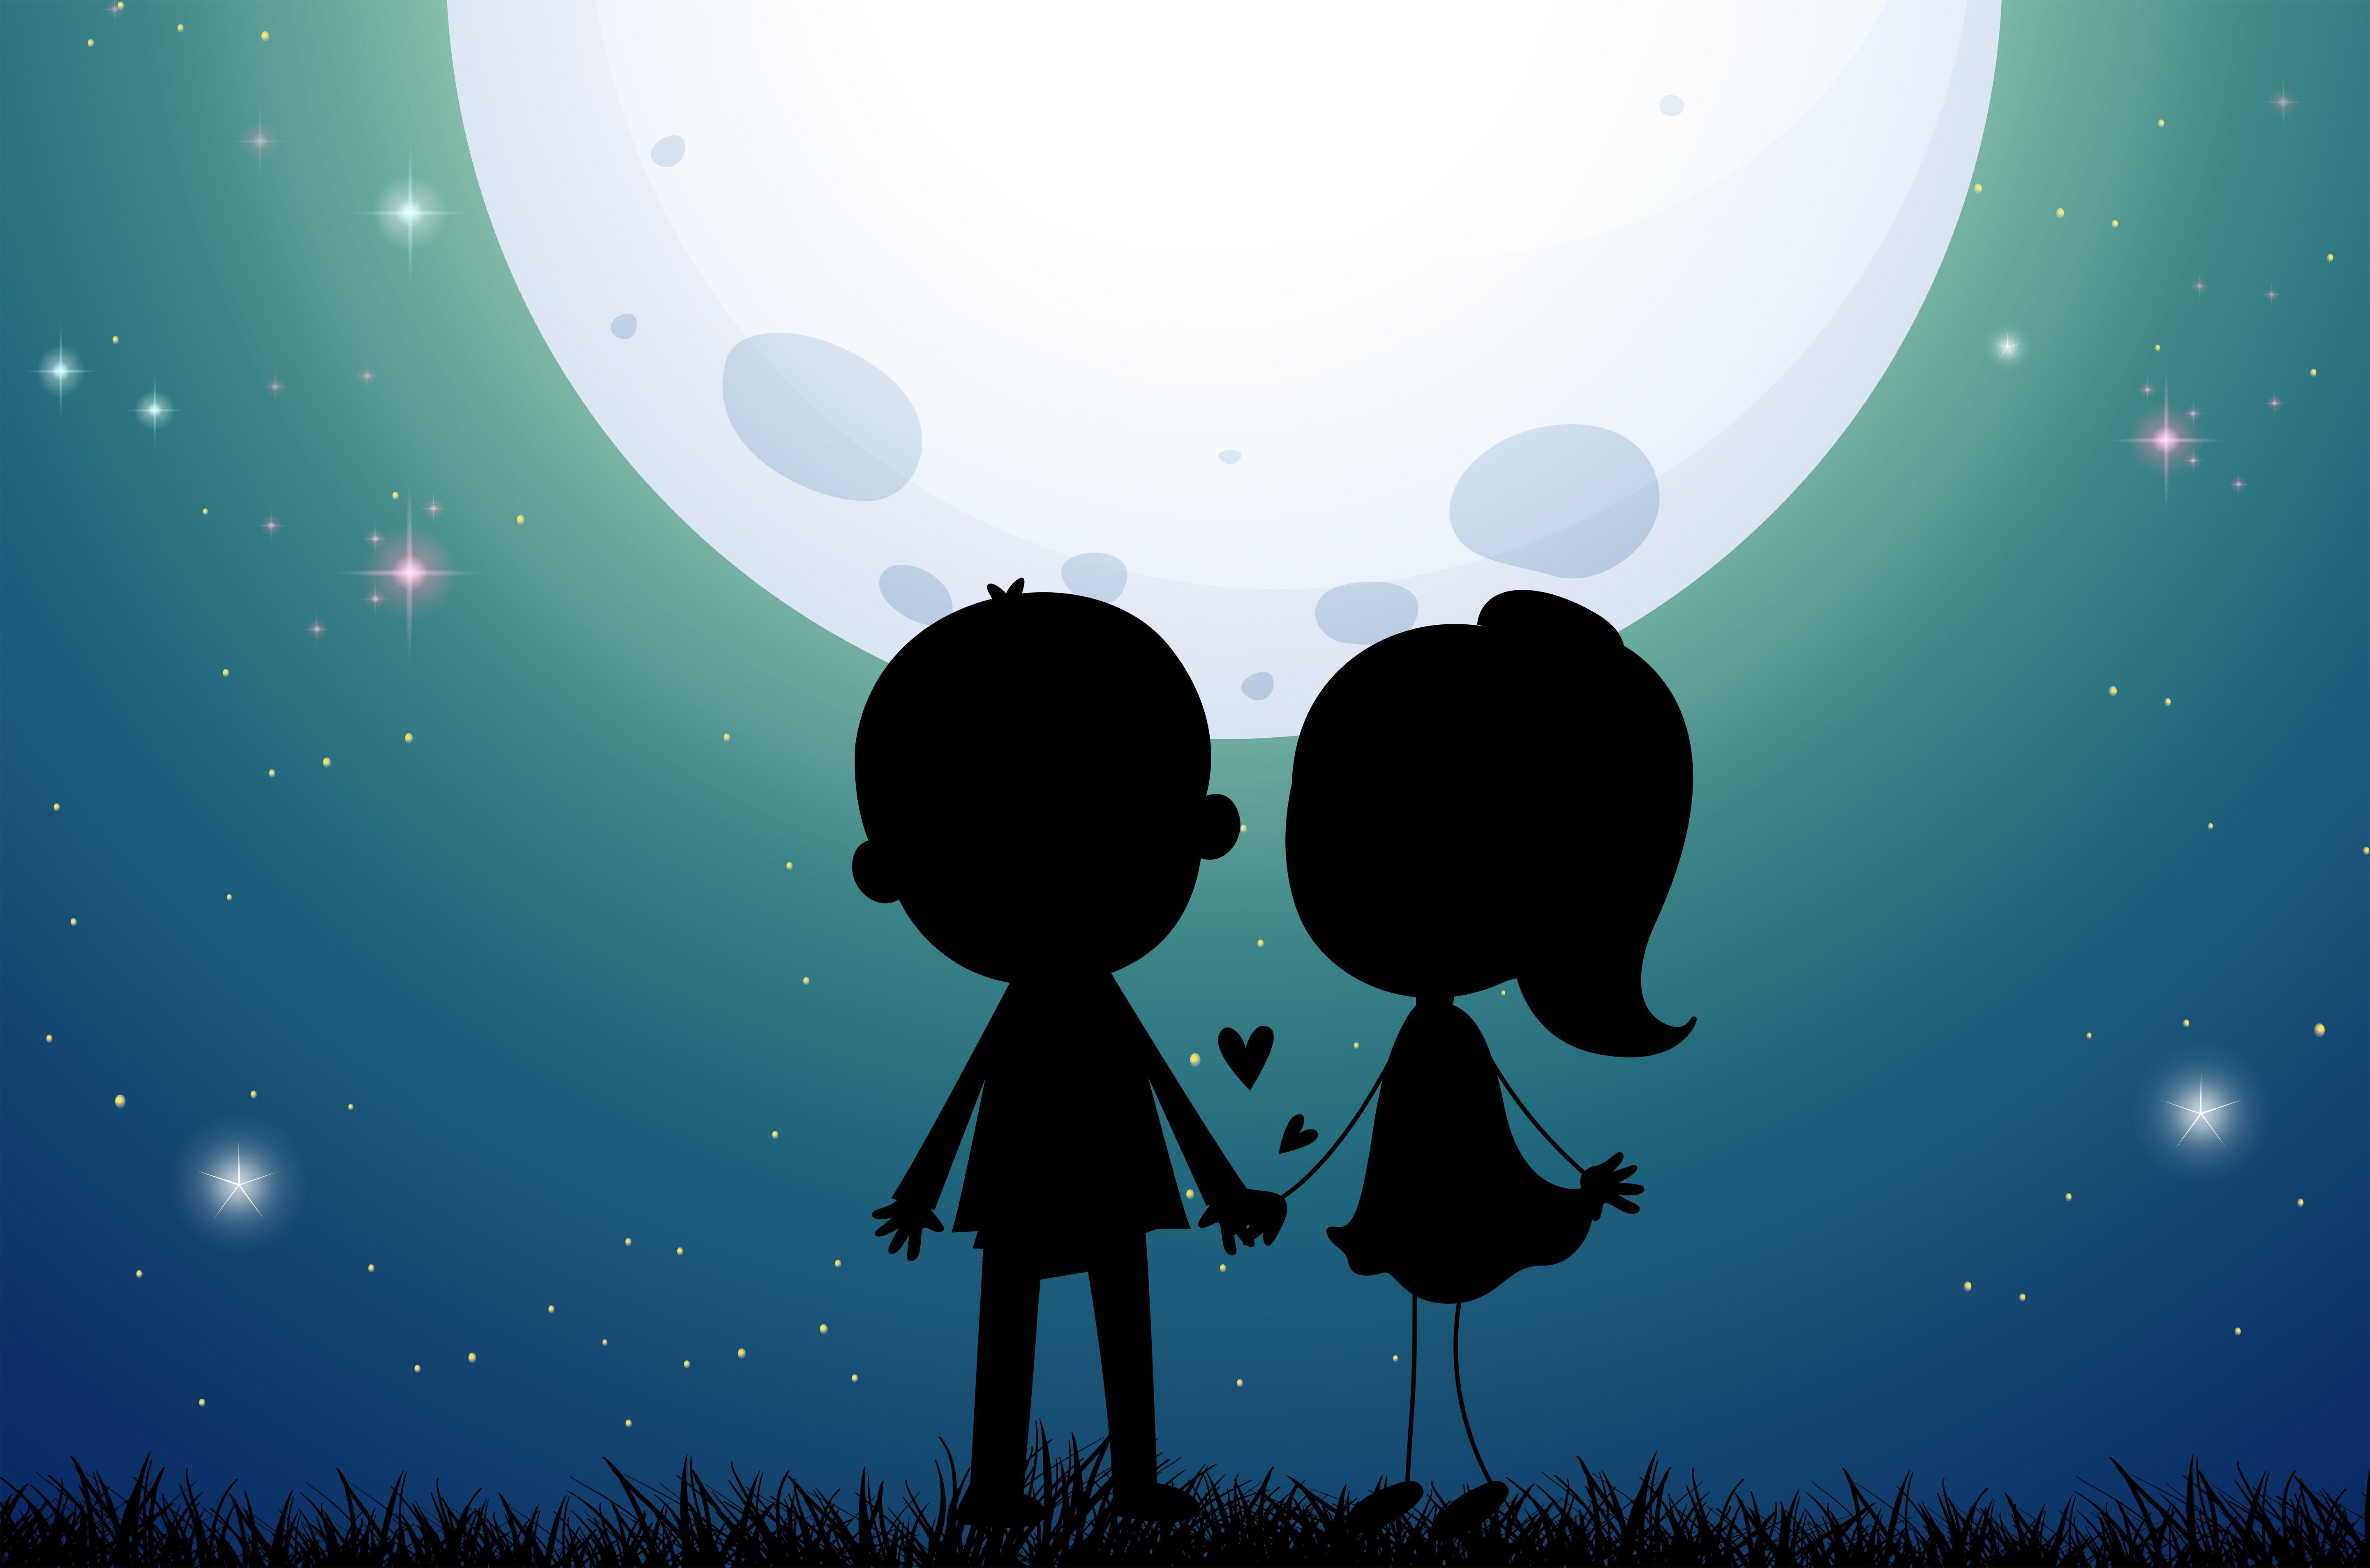 couple silhouette art 1574939717 - Couple Silhouette Art -